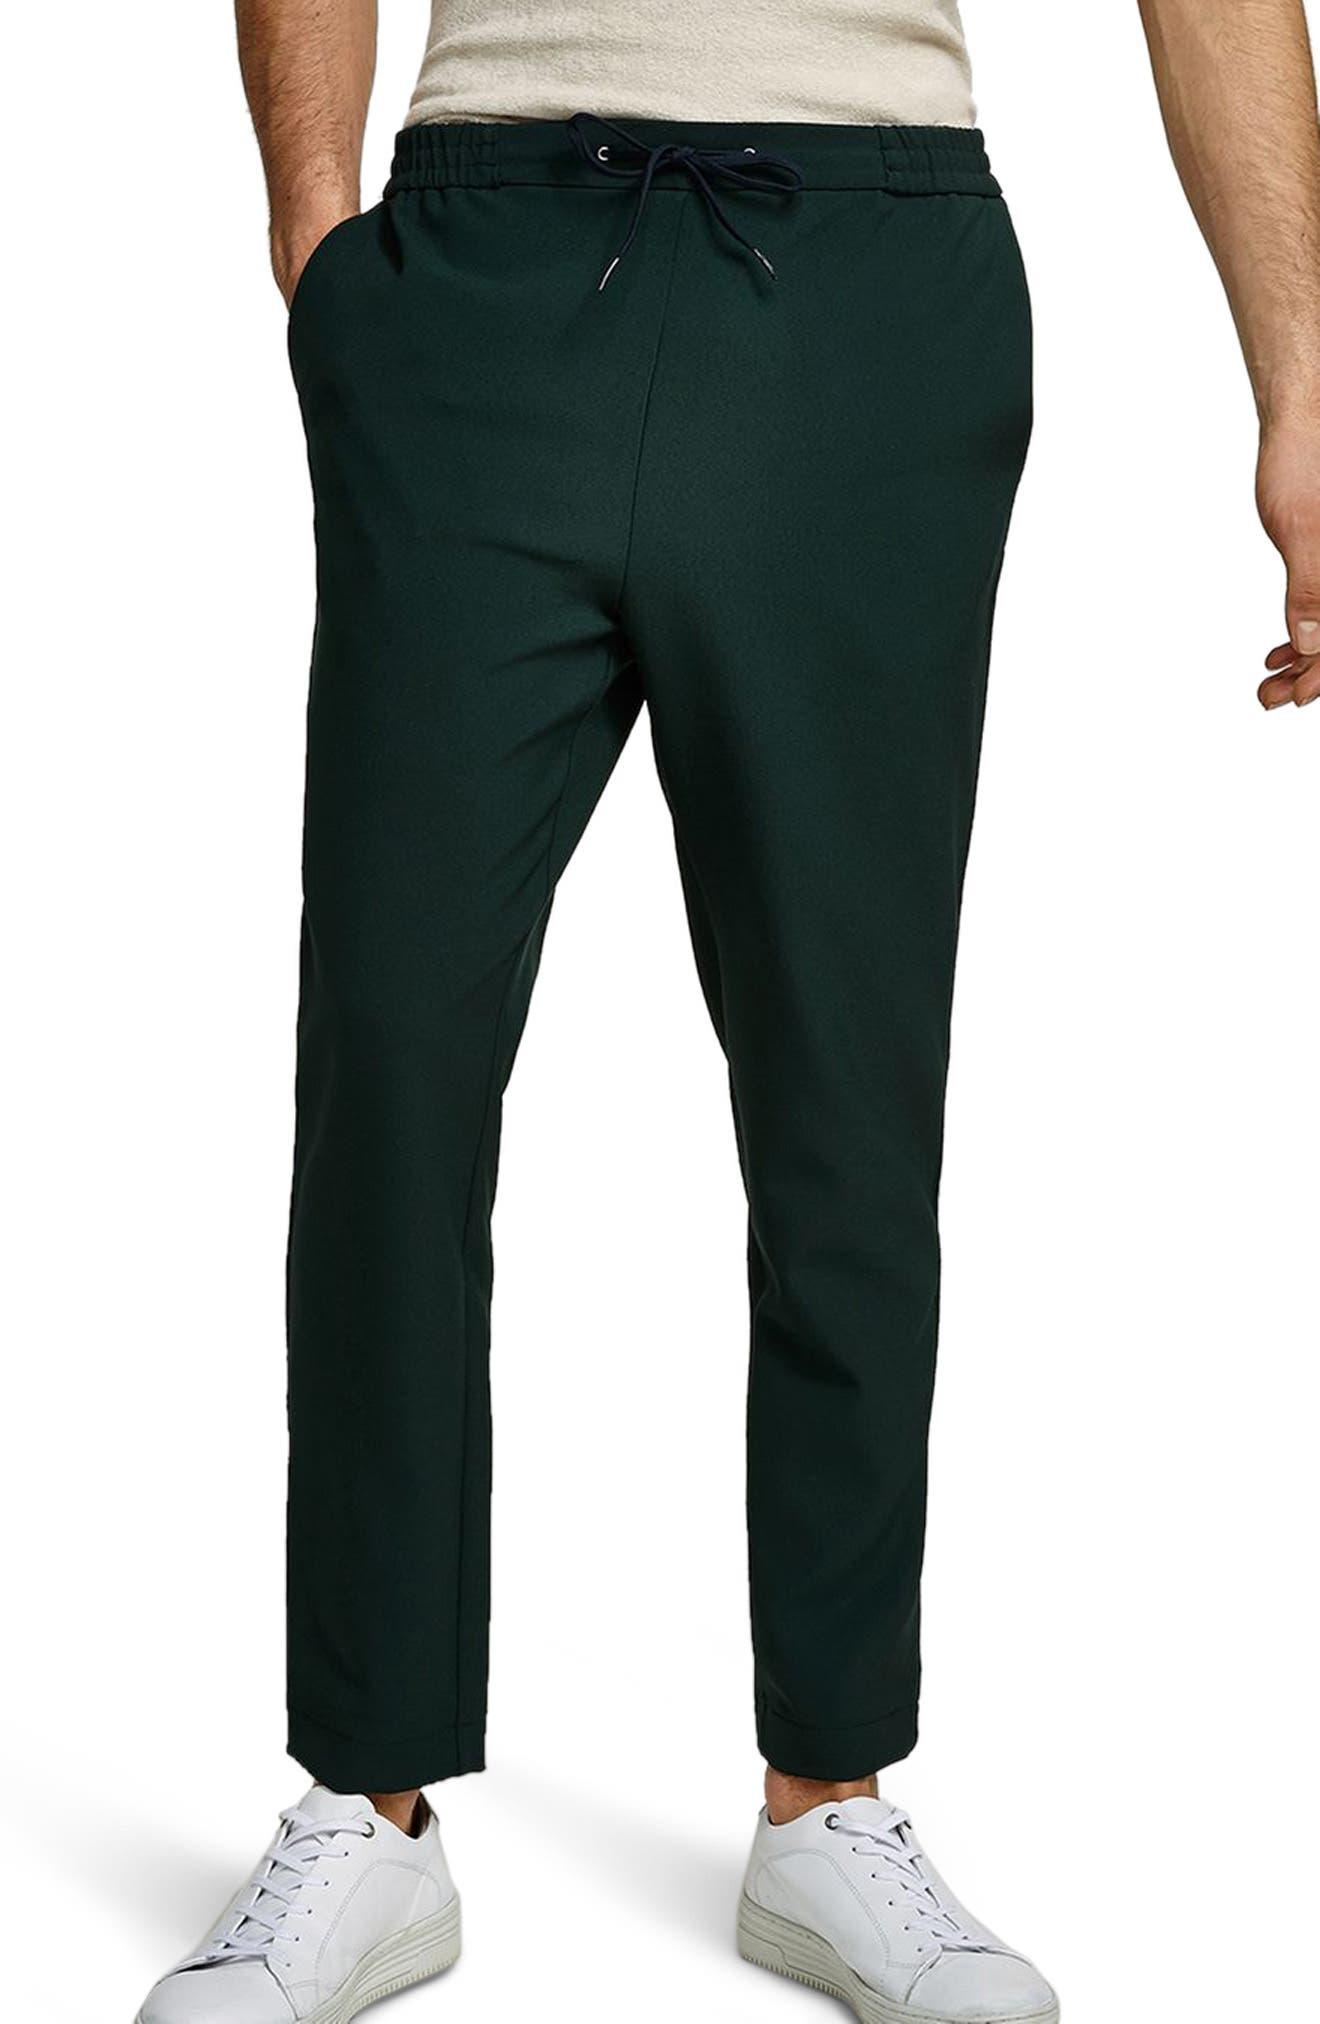 Slim Cropped Track Pants,                             Main thumbnail 1, color,                             Green Multi